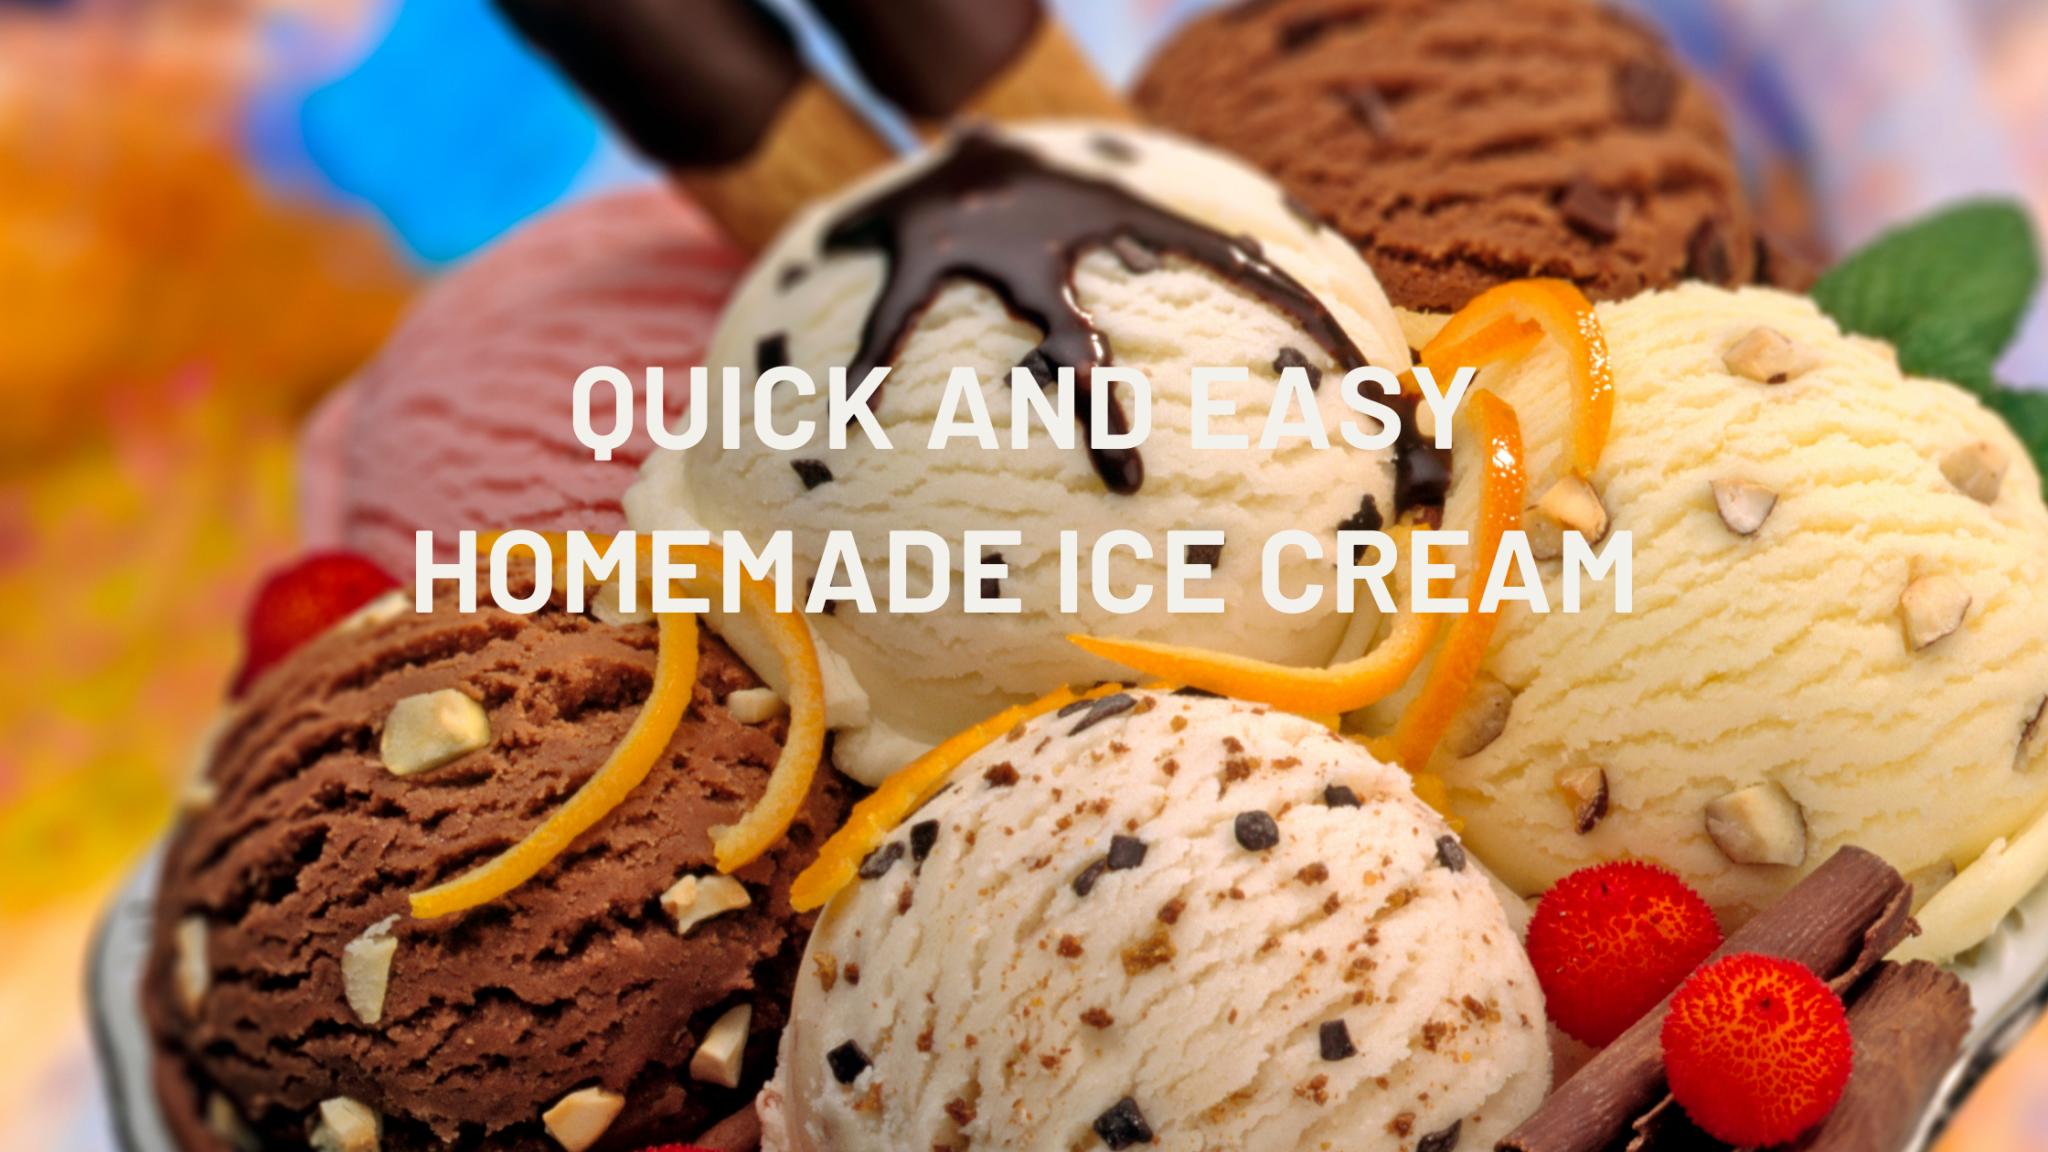 Quick and Easy Homemade Ice Cream